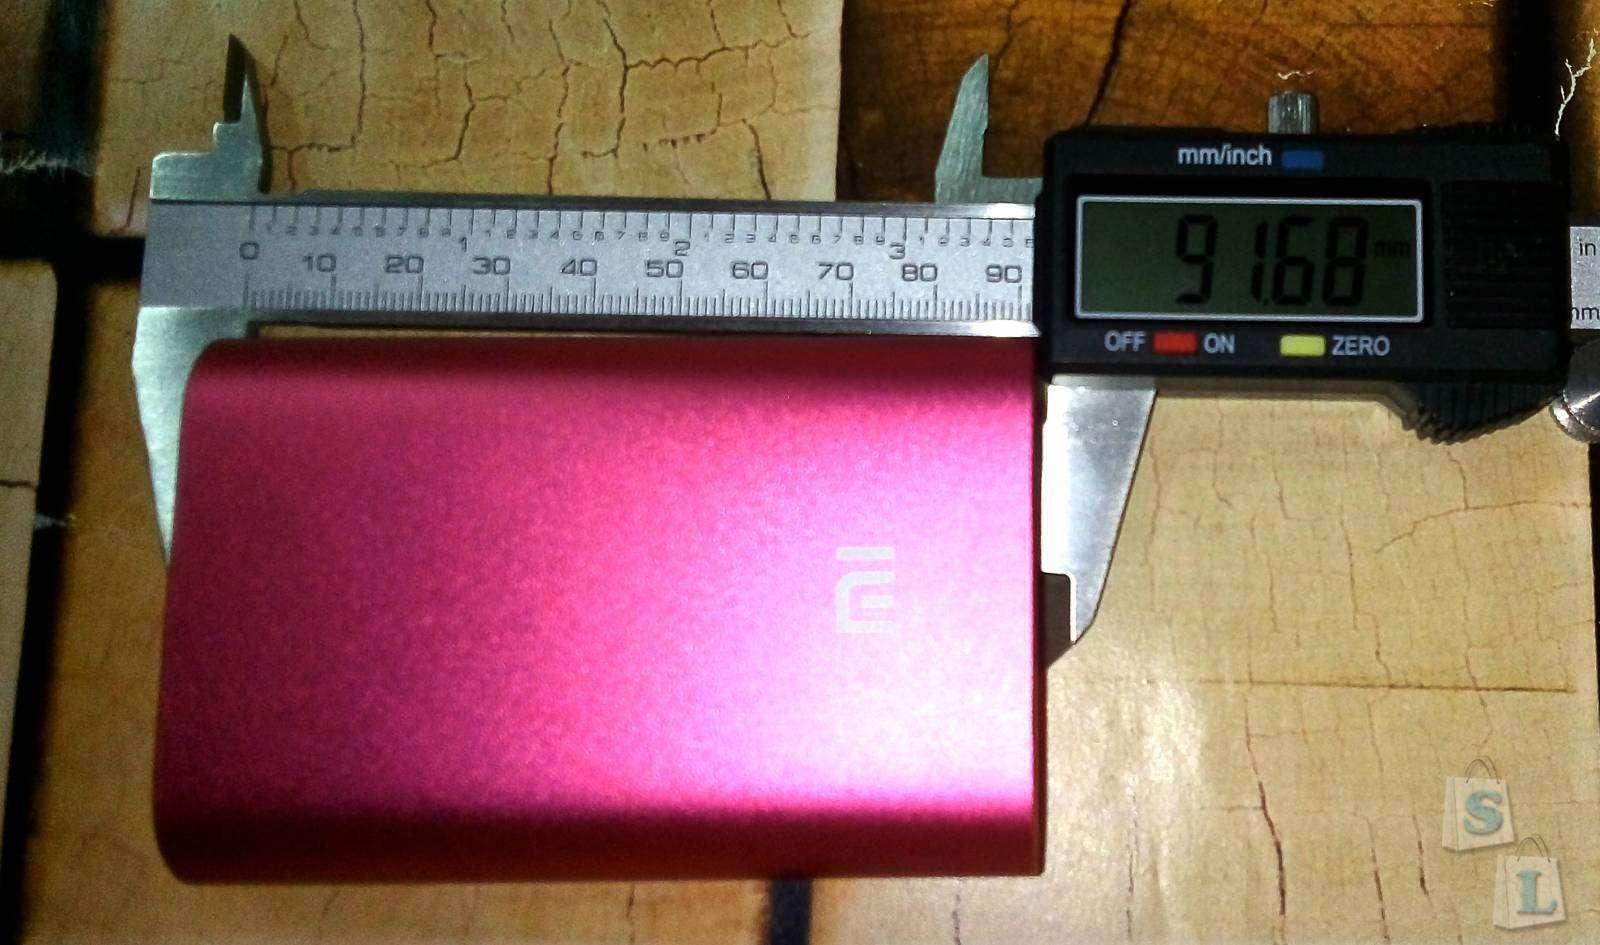 Banggood: Розовый павербанк XIAOMI 5.1V 2.1A 10000mAh - обзор и конечно тест